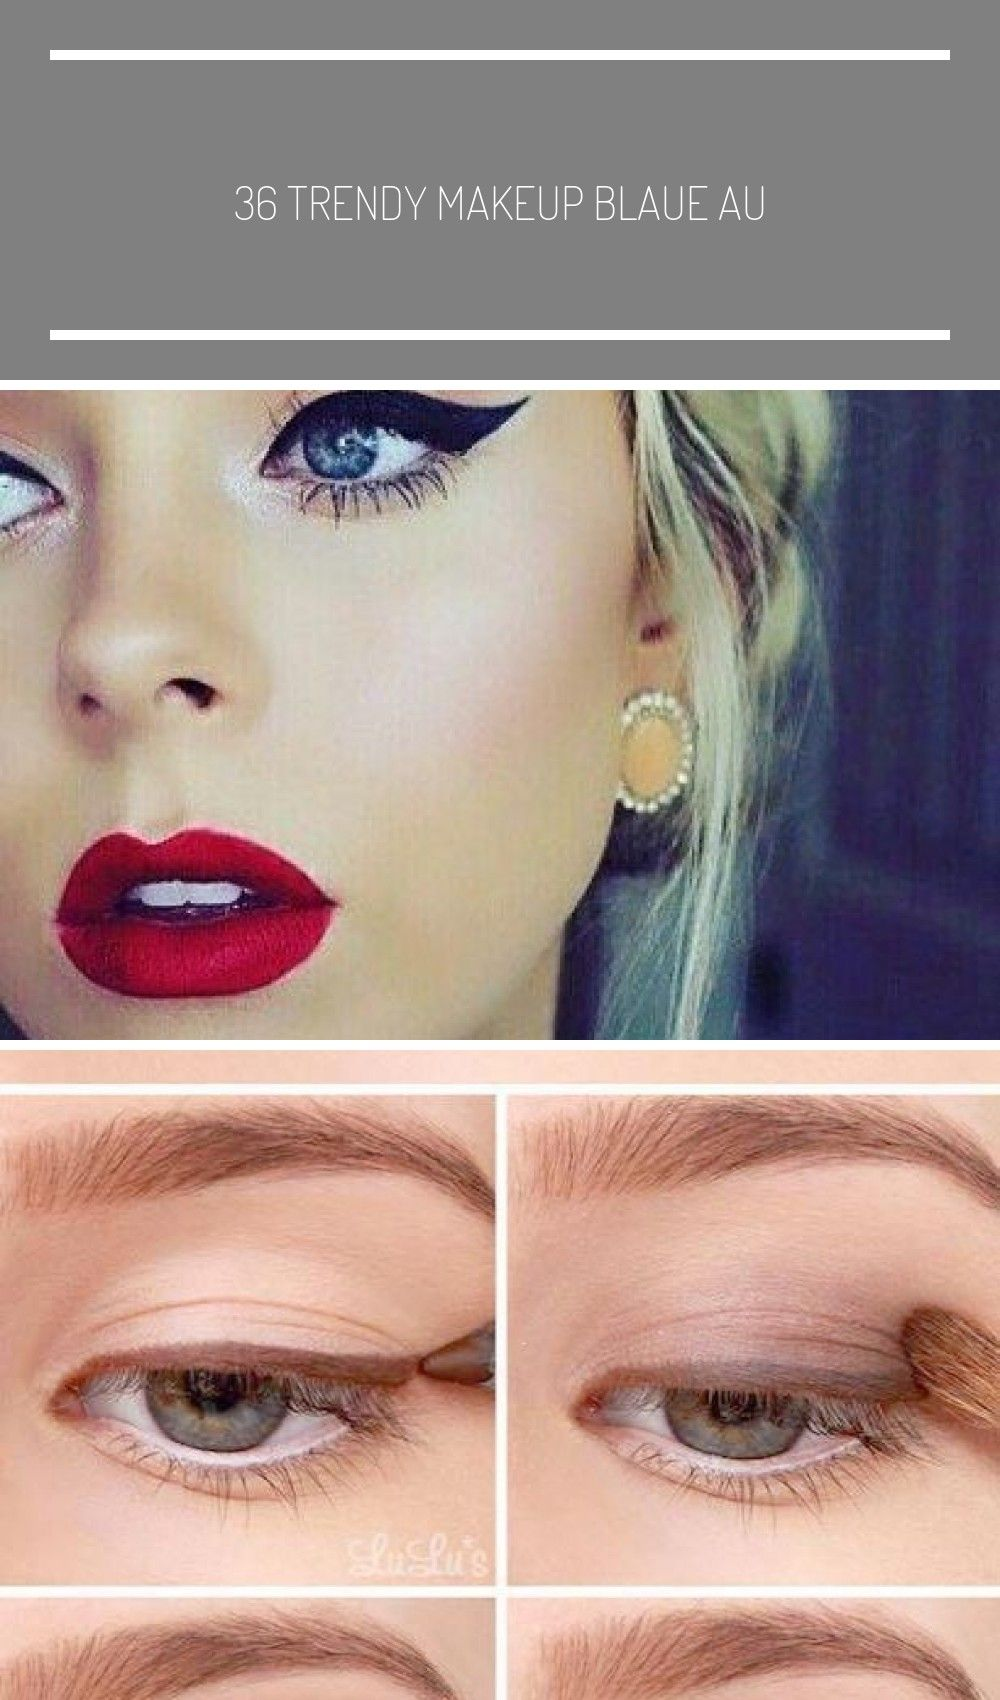 36 Trendy Makeup Blaue Augen Blondes Haar Rote Lippen Lippenstifte - ... - up for blue eyes blonde